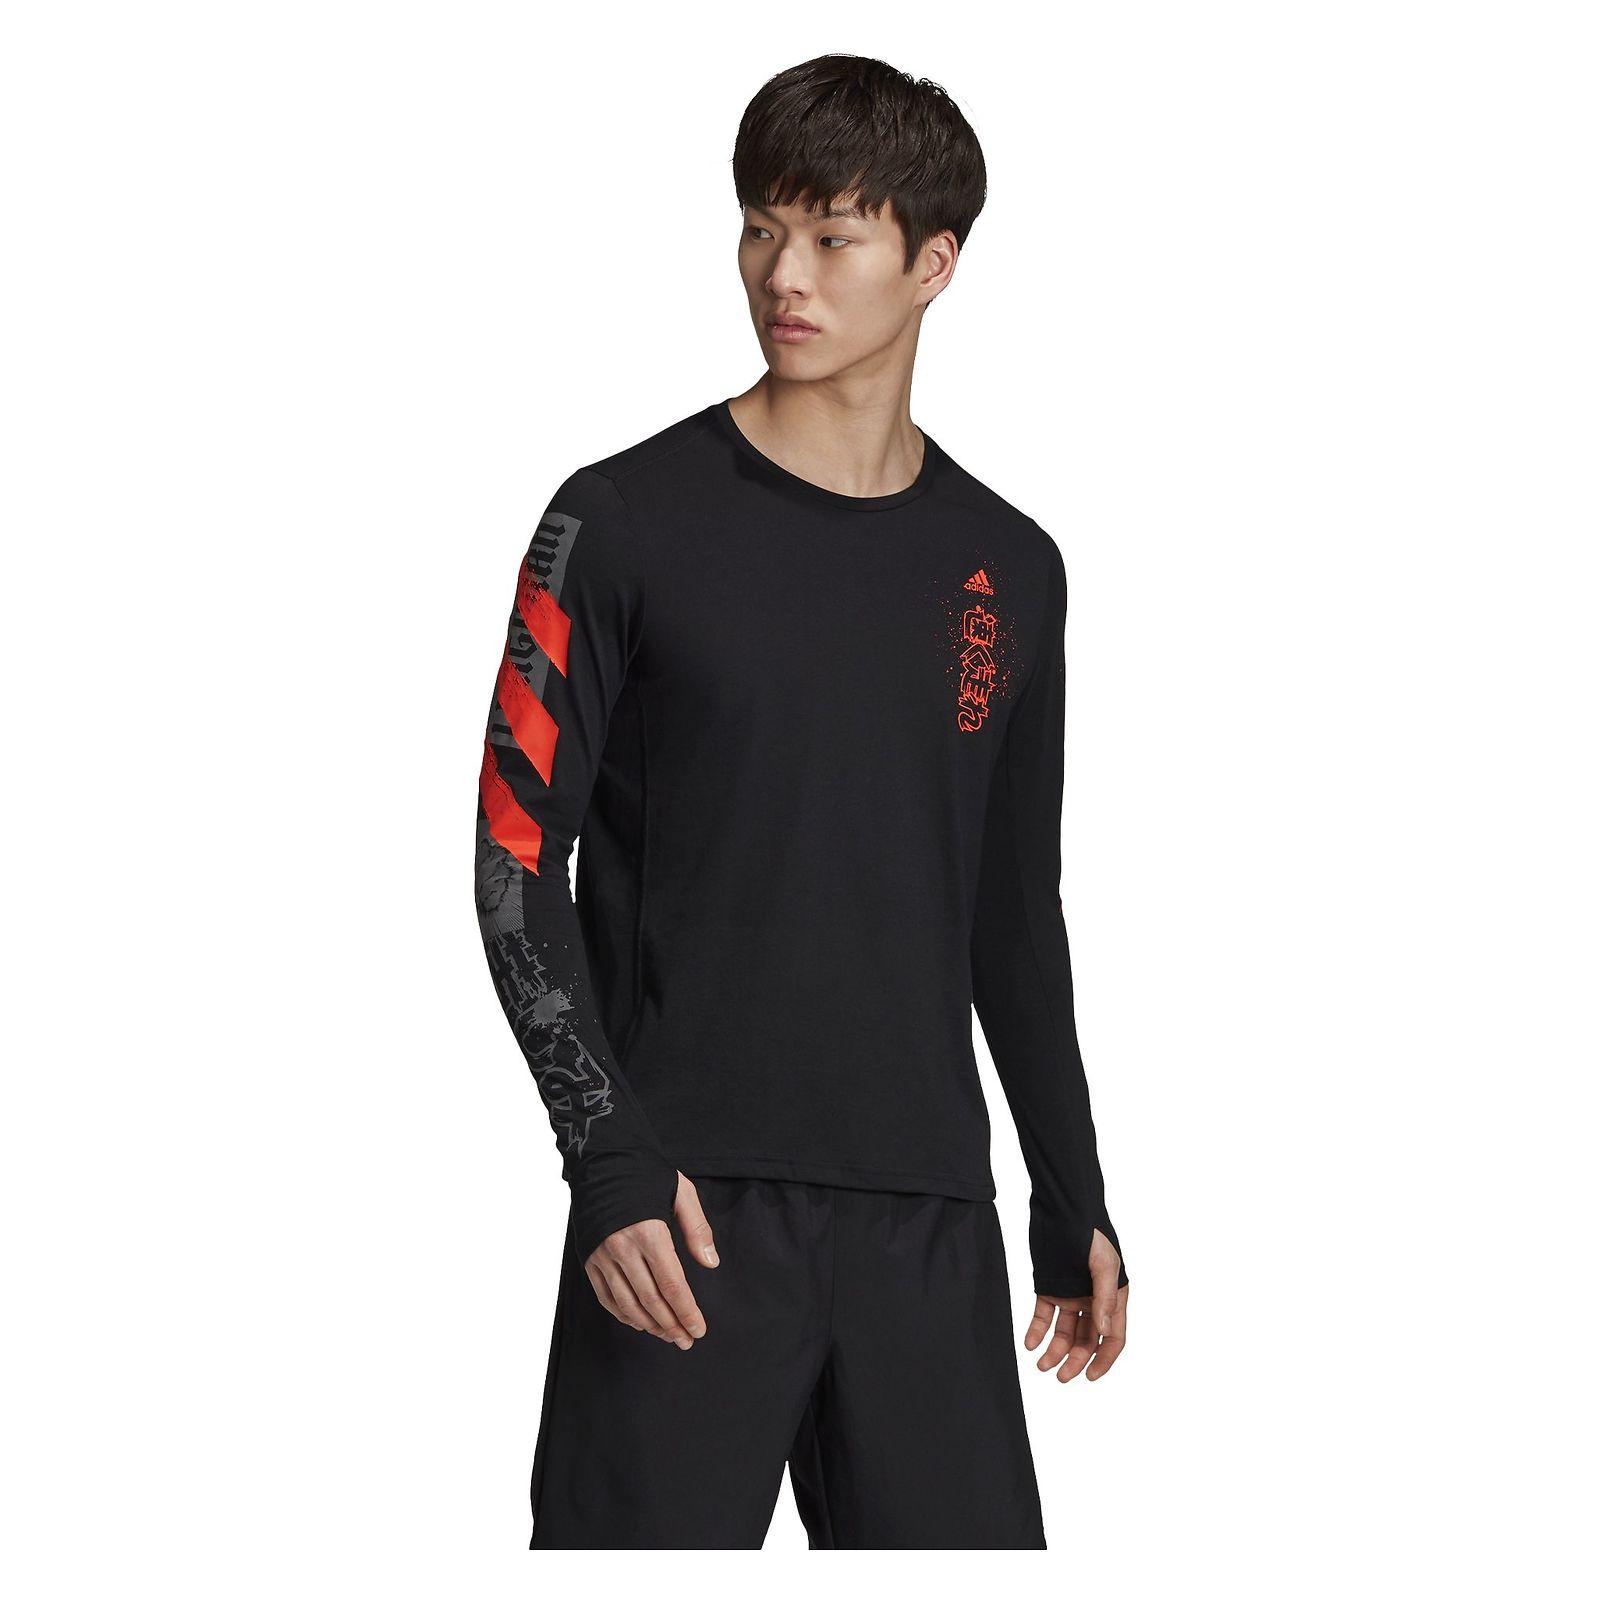 Koszulka męska do biegania adidas Fast Graphic FJ5000